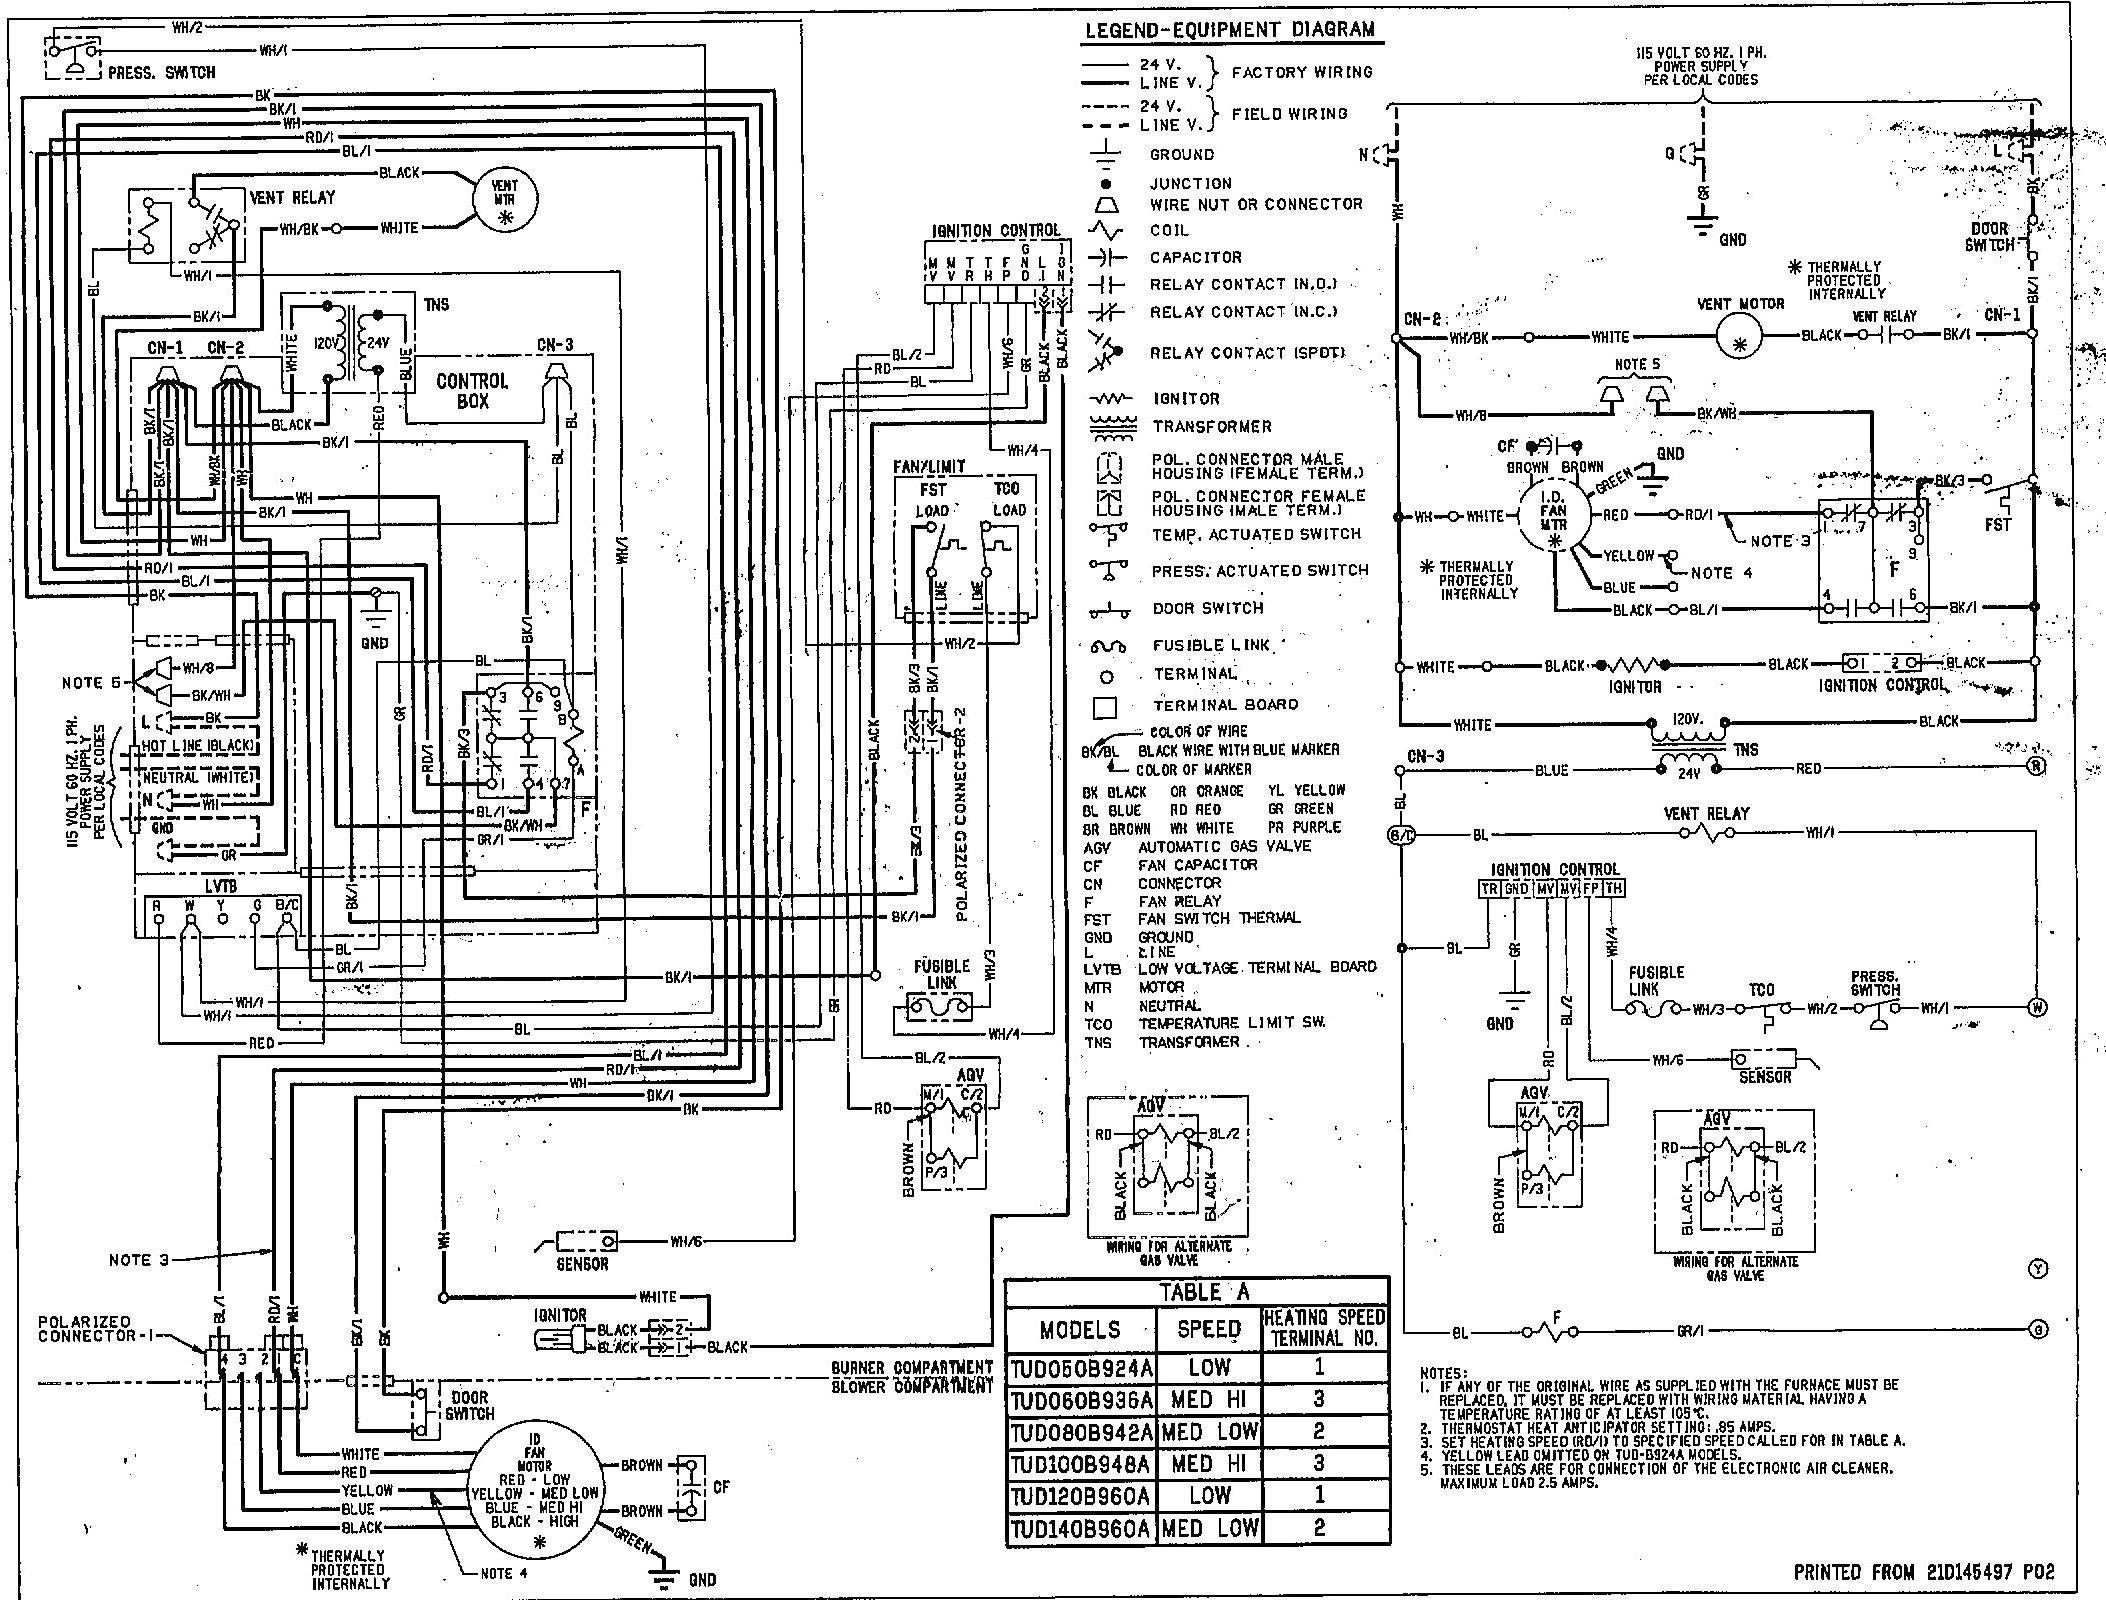 Trane Xl 1200 Wiring Diagram Fresh Trane Xl1200 Heat Pump Wiring Diagram Mastertopforum